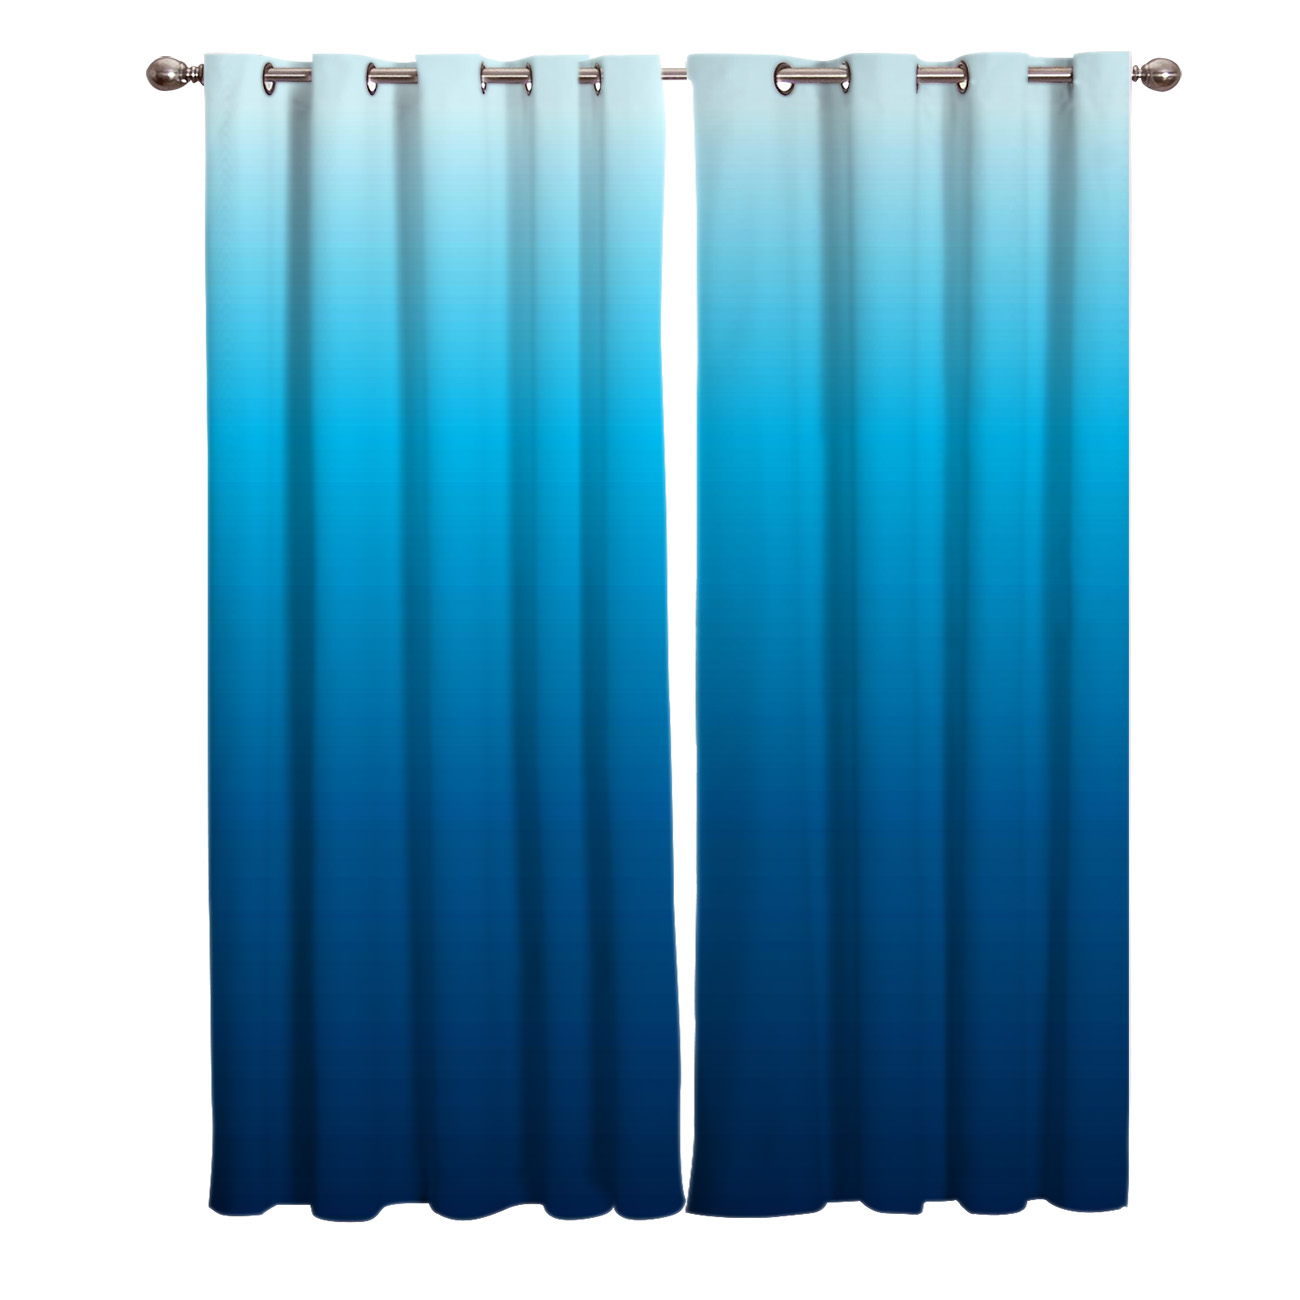 Sea Blue Gradient Summer Window Treatments Curtains Valance Living Room Bedroom Outdoor Decor Window Treatment Ideas Curtain Curtains Aliexpress